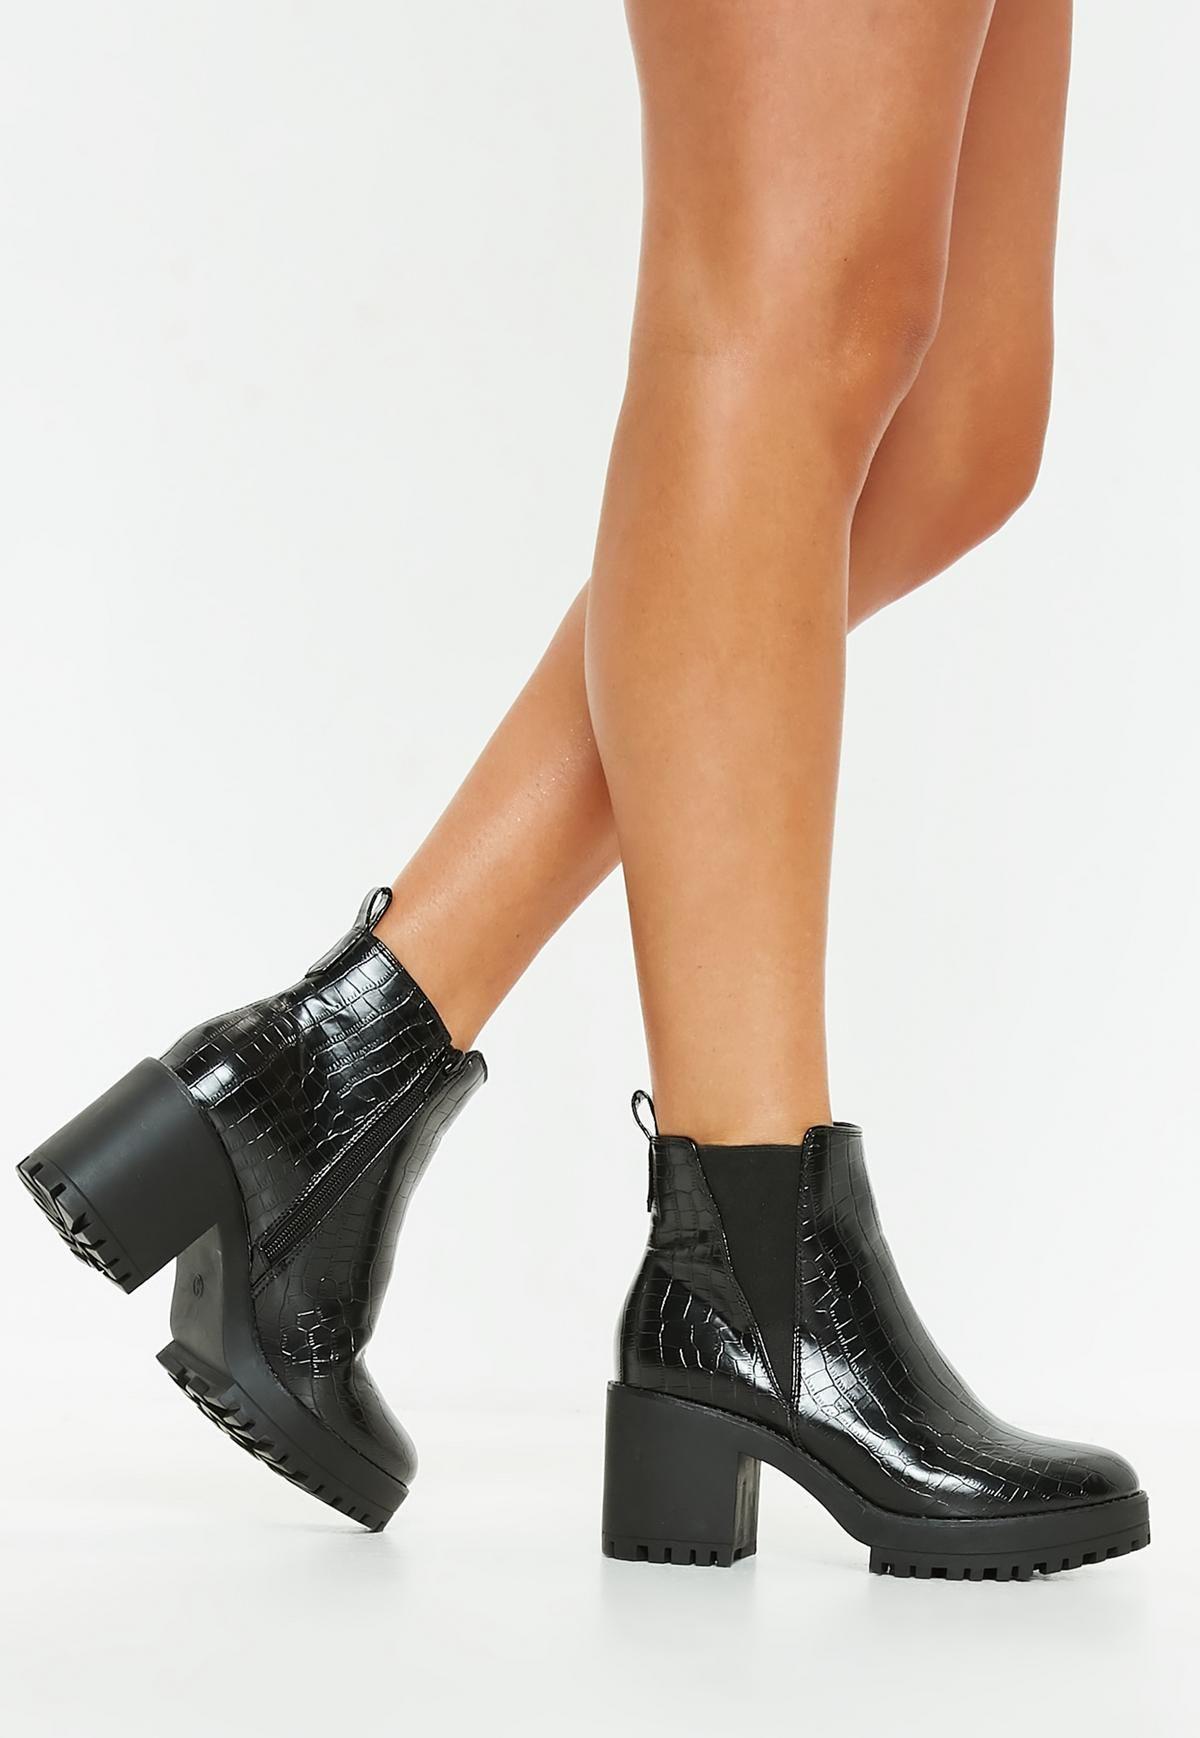 Black Chelsea Croc Ankle Chunky BootShoesChaussure FcT3KlJ1